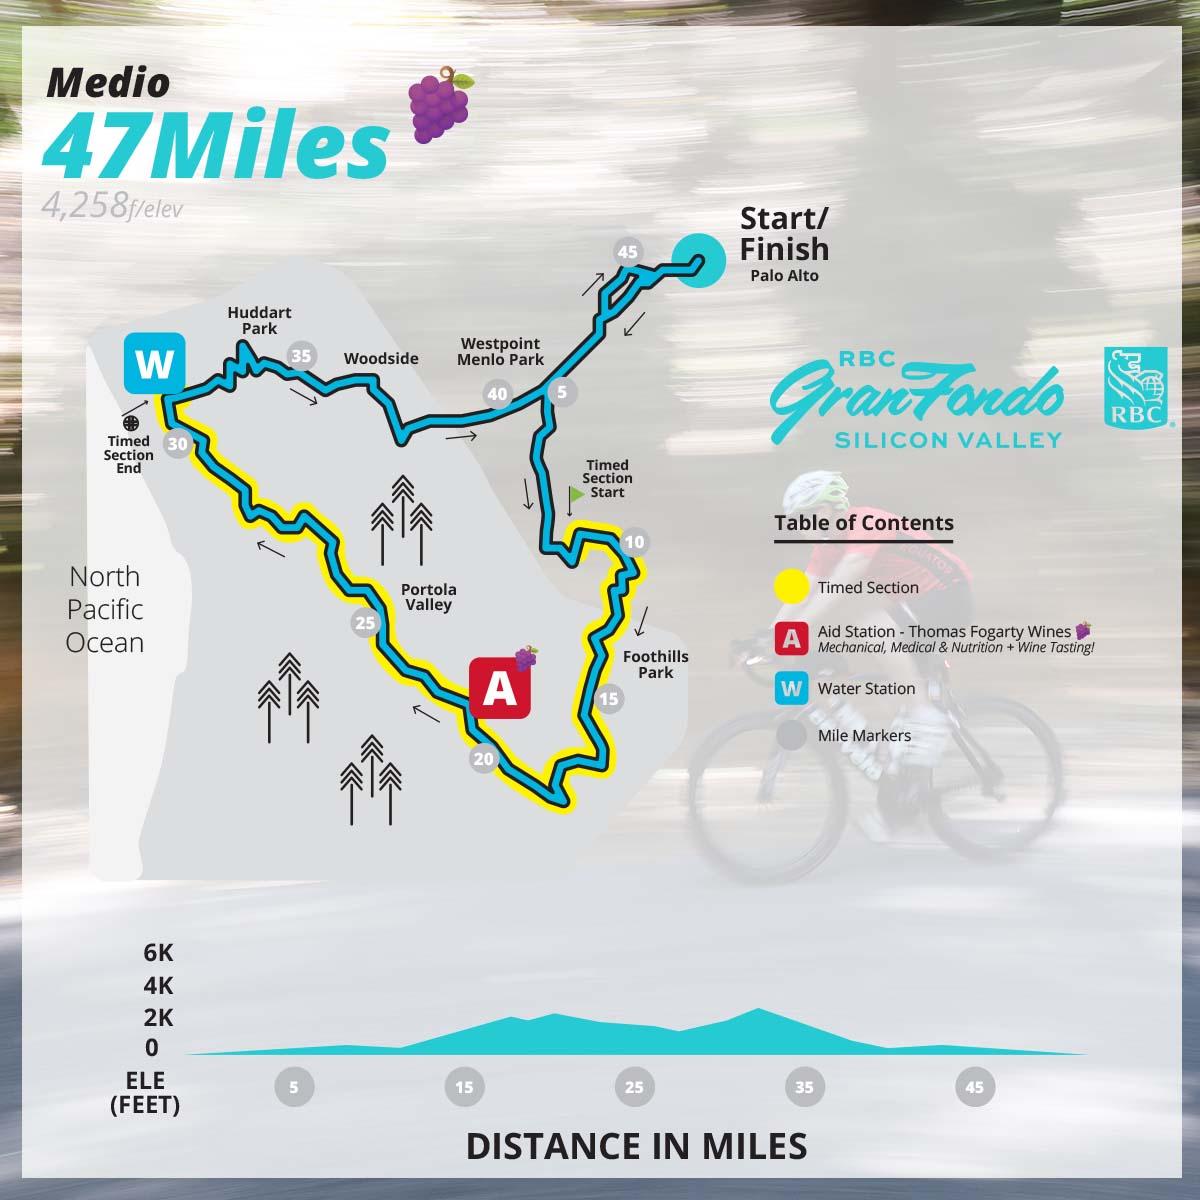 Medio course map